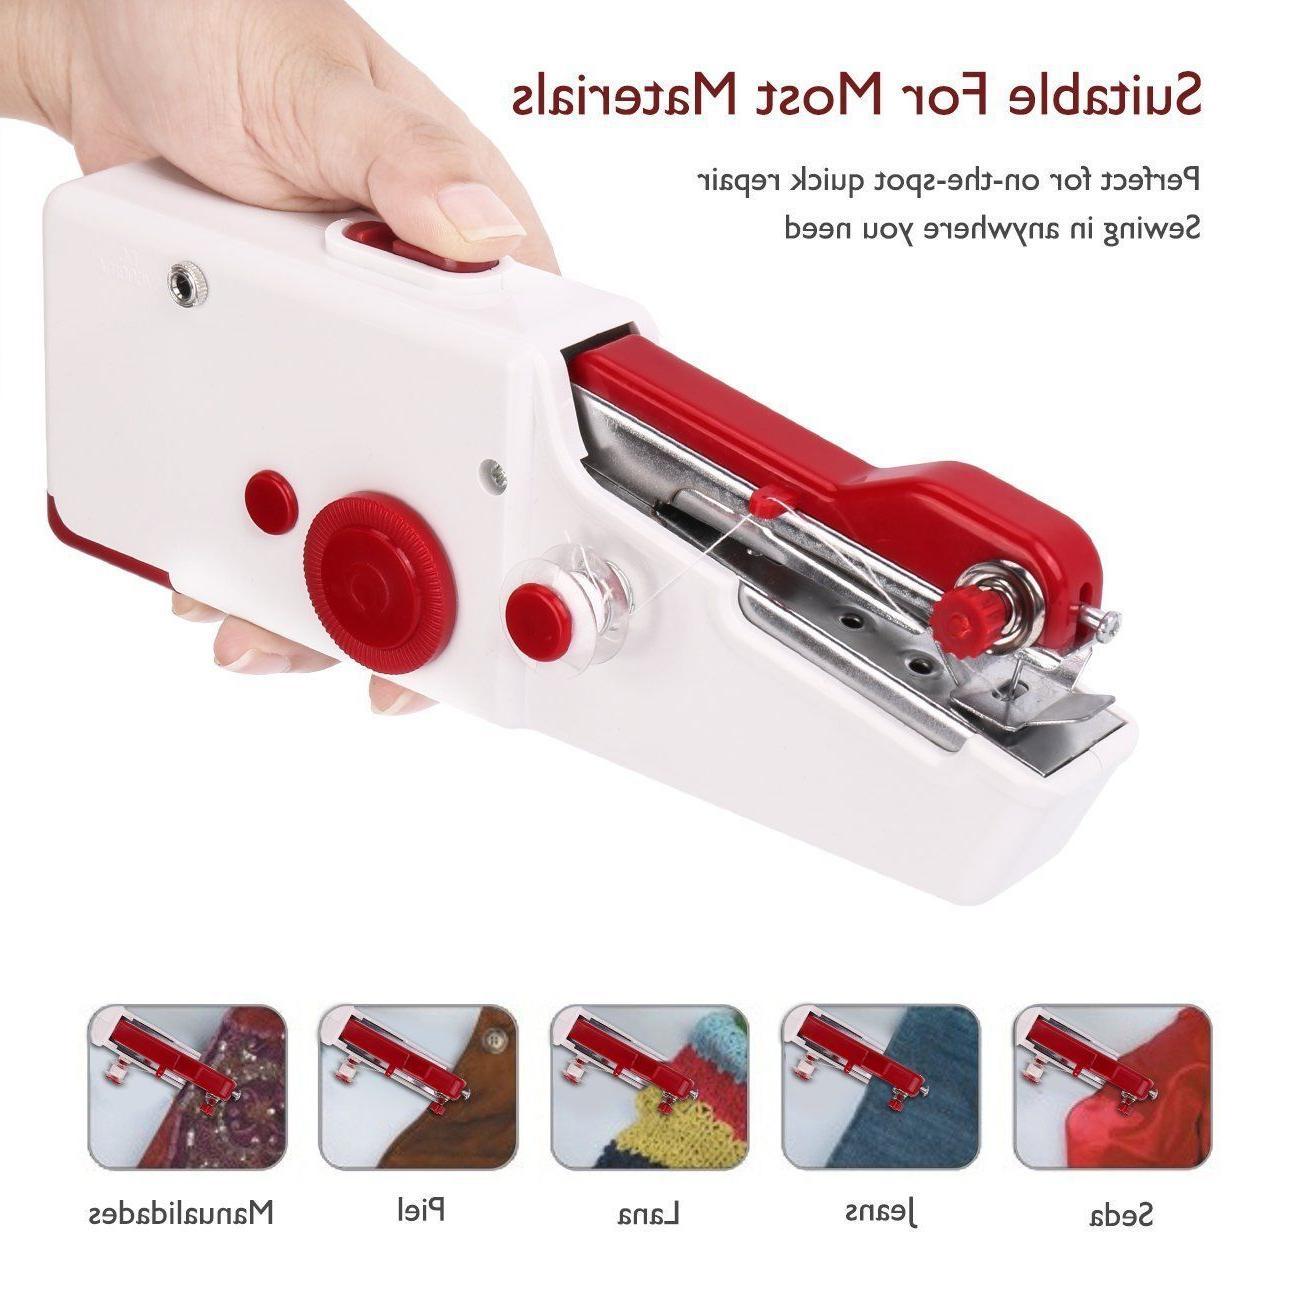 Portable Sew Hand Held Quick Handy Repair,